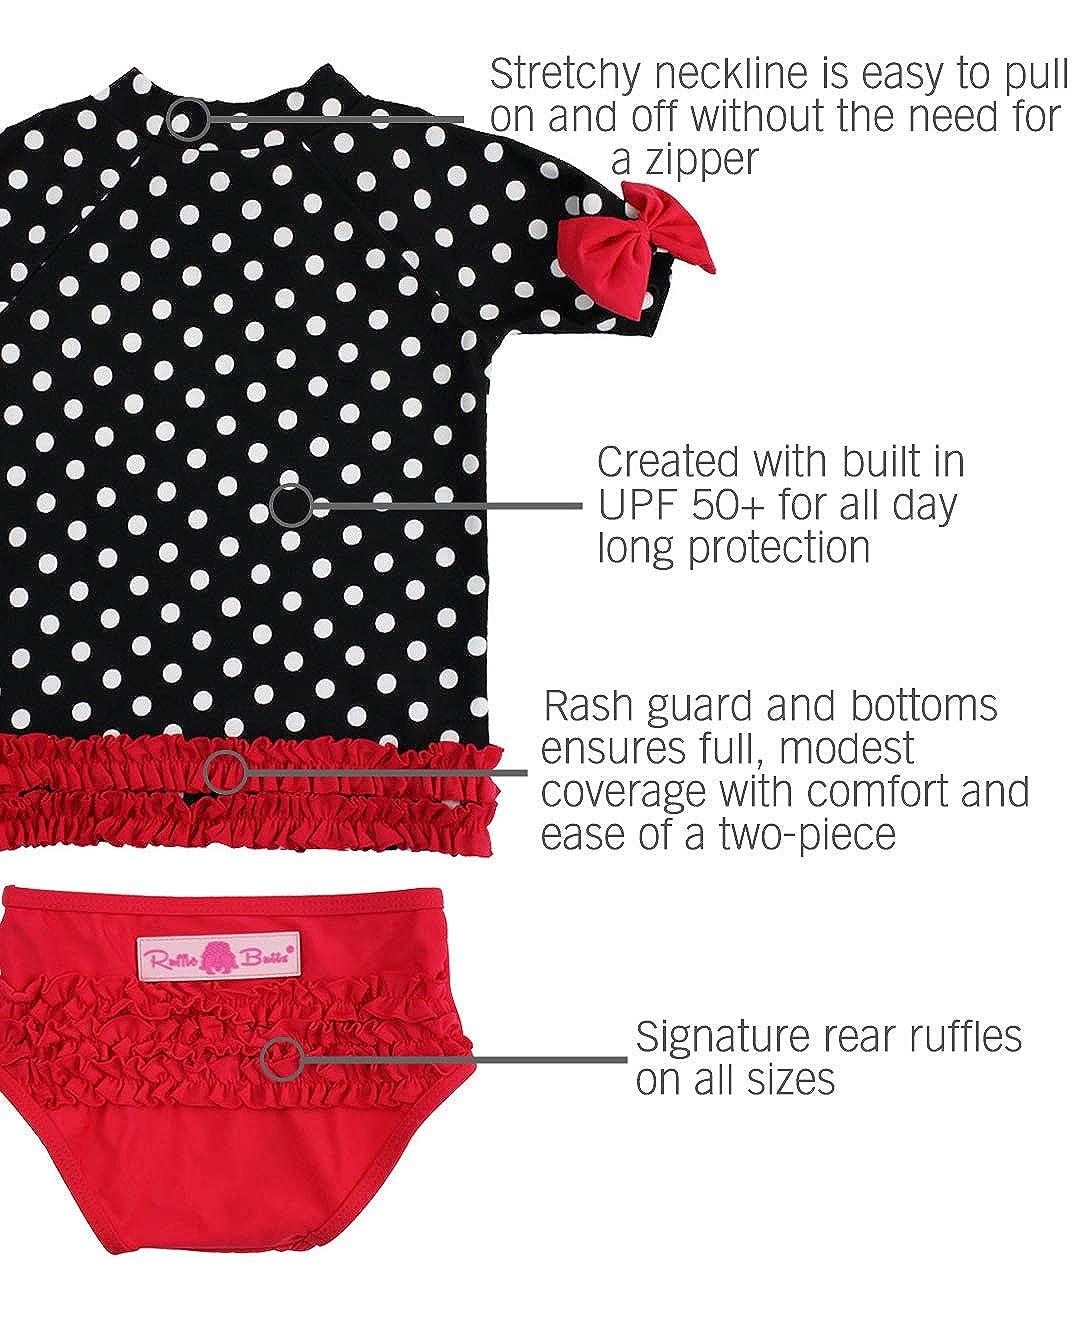 Sun Protection RGSYYXX-SSPD-SC-TDLR RuffleButts Little Girls Rash Guard Short Sleeve 2-Piece Swimsuit Set Polka Dot Bikini with UPF 50